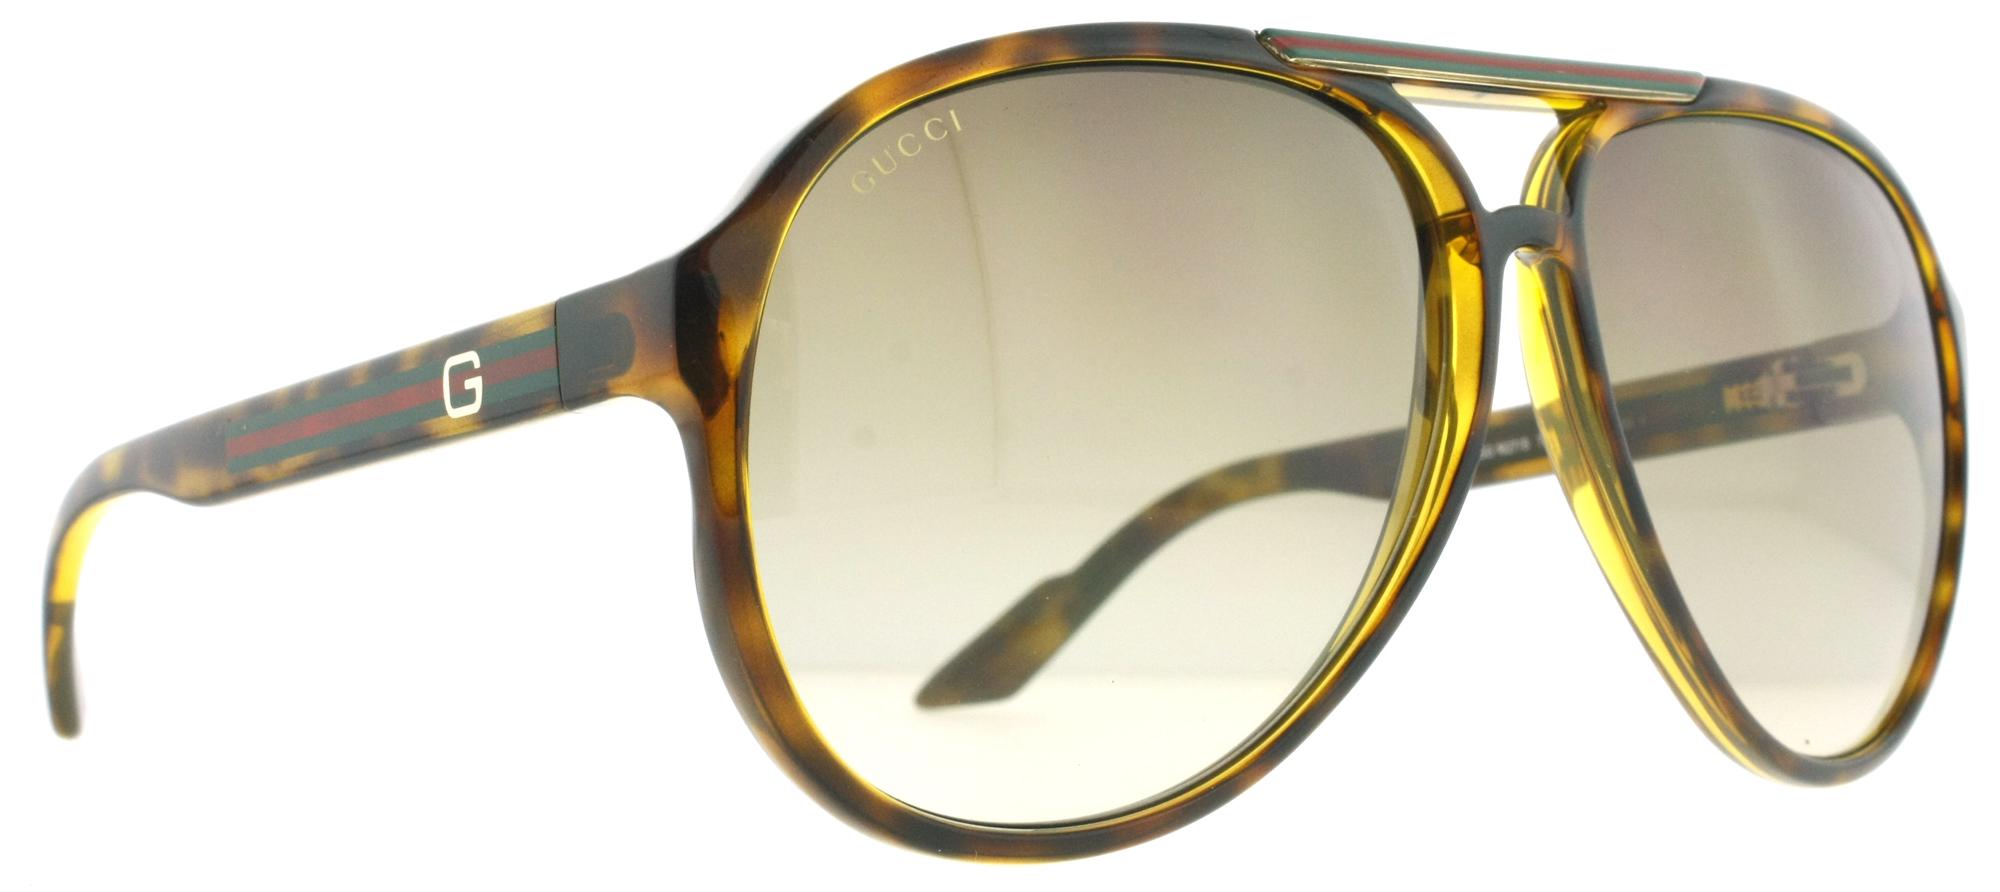 9b5de6ff44cc ... www.semadatacoop.org. Gucci GG 1627 S 7911W Havana GG1627 S Aviator  Unisex Sunglasses